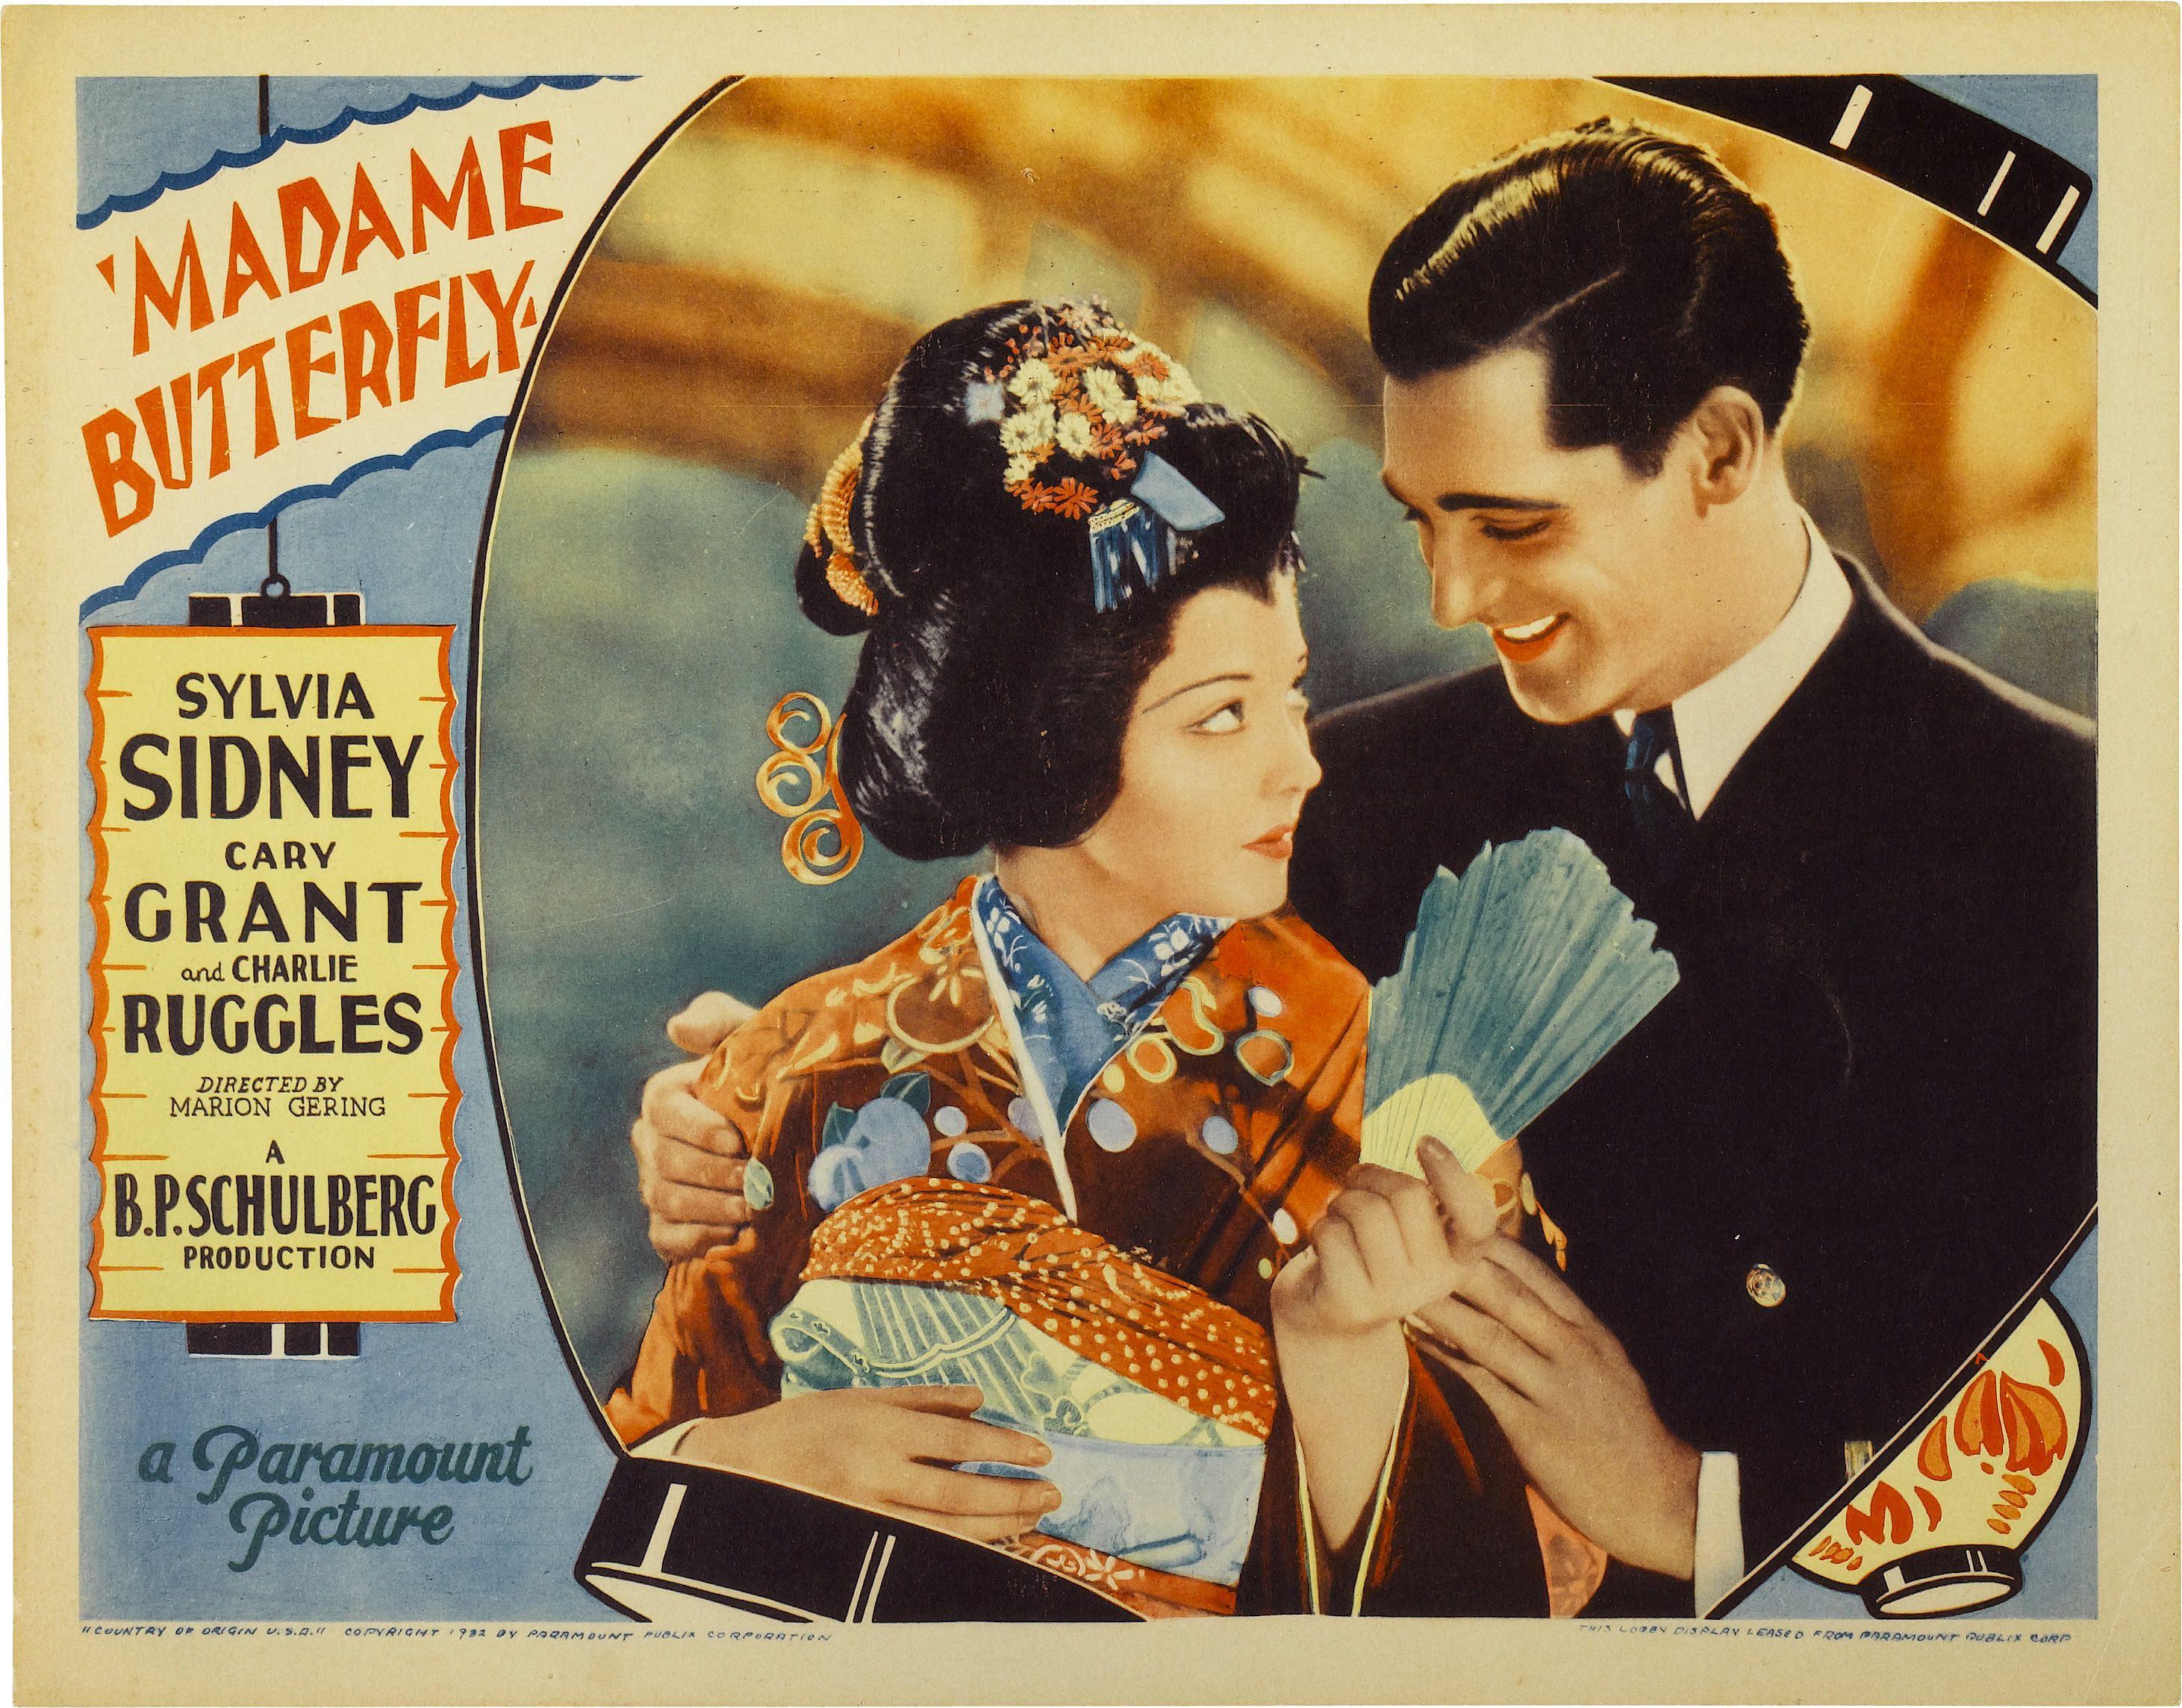 Madame Butterfly: Madame Butterfly (1915) And Madame Butterfly (1932)